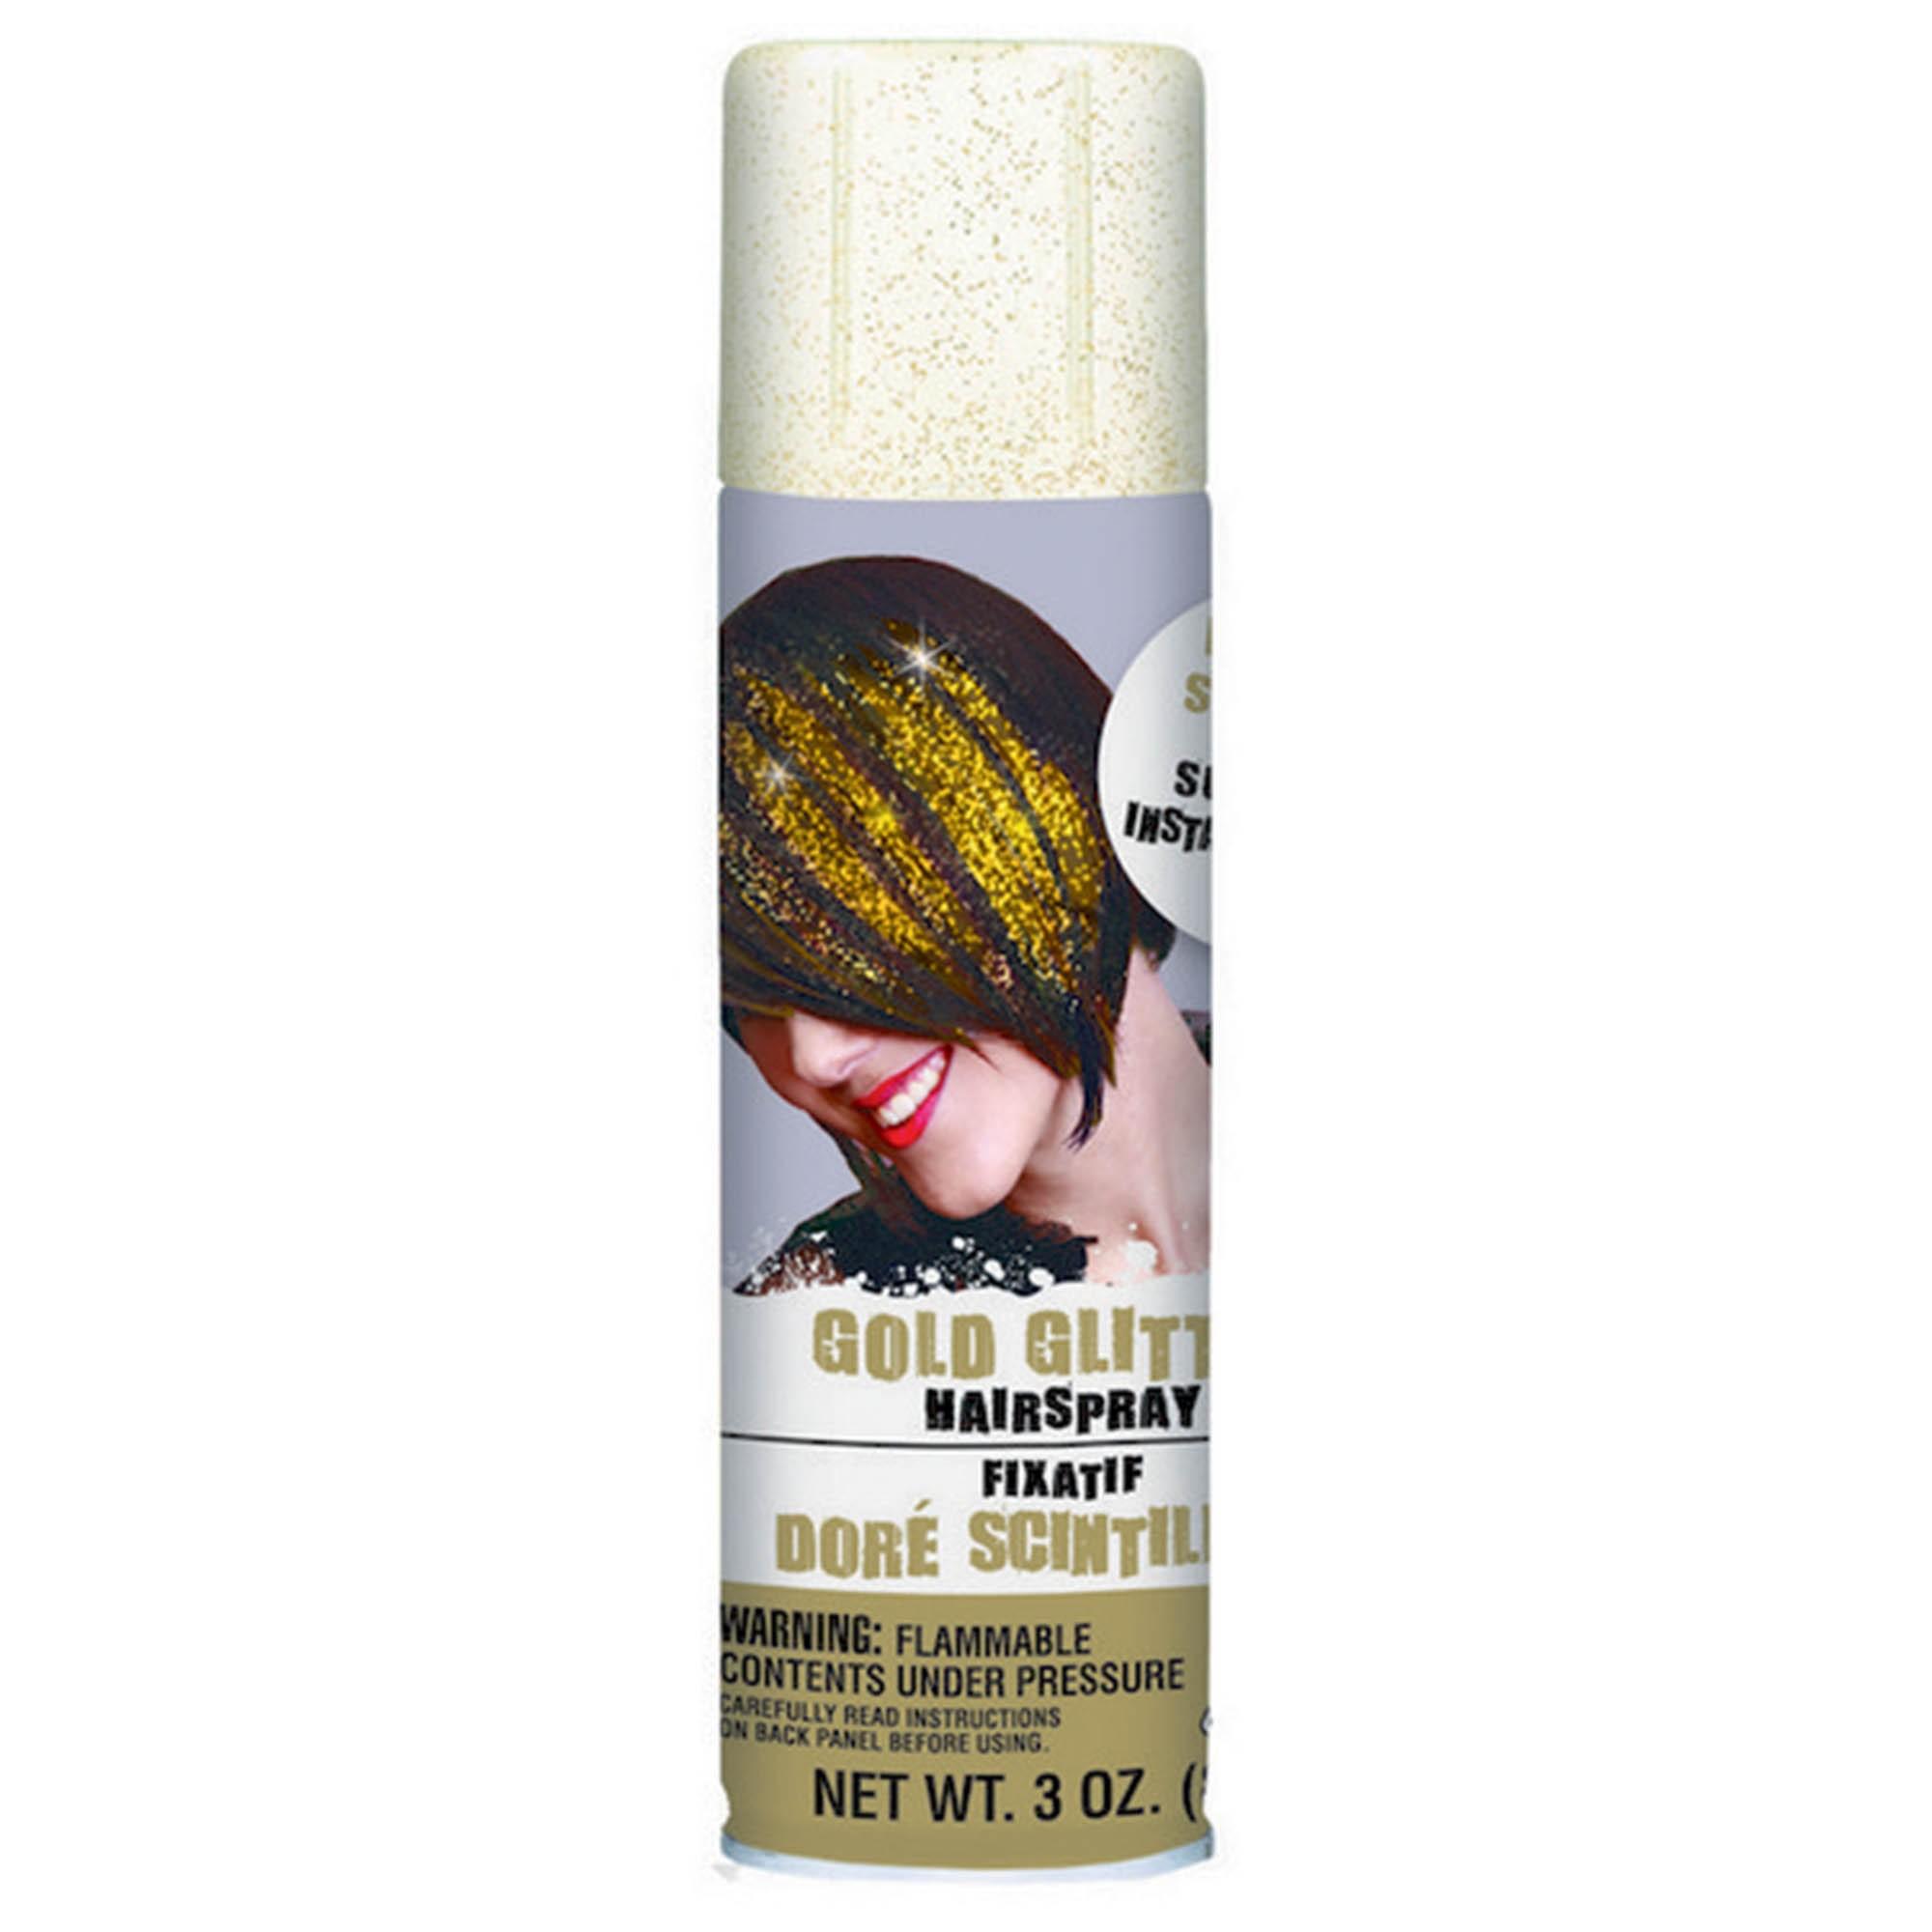 Hair Spray - Gold